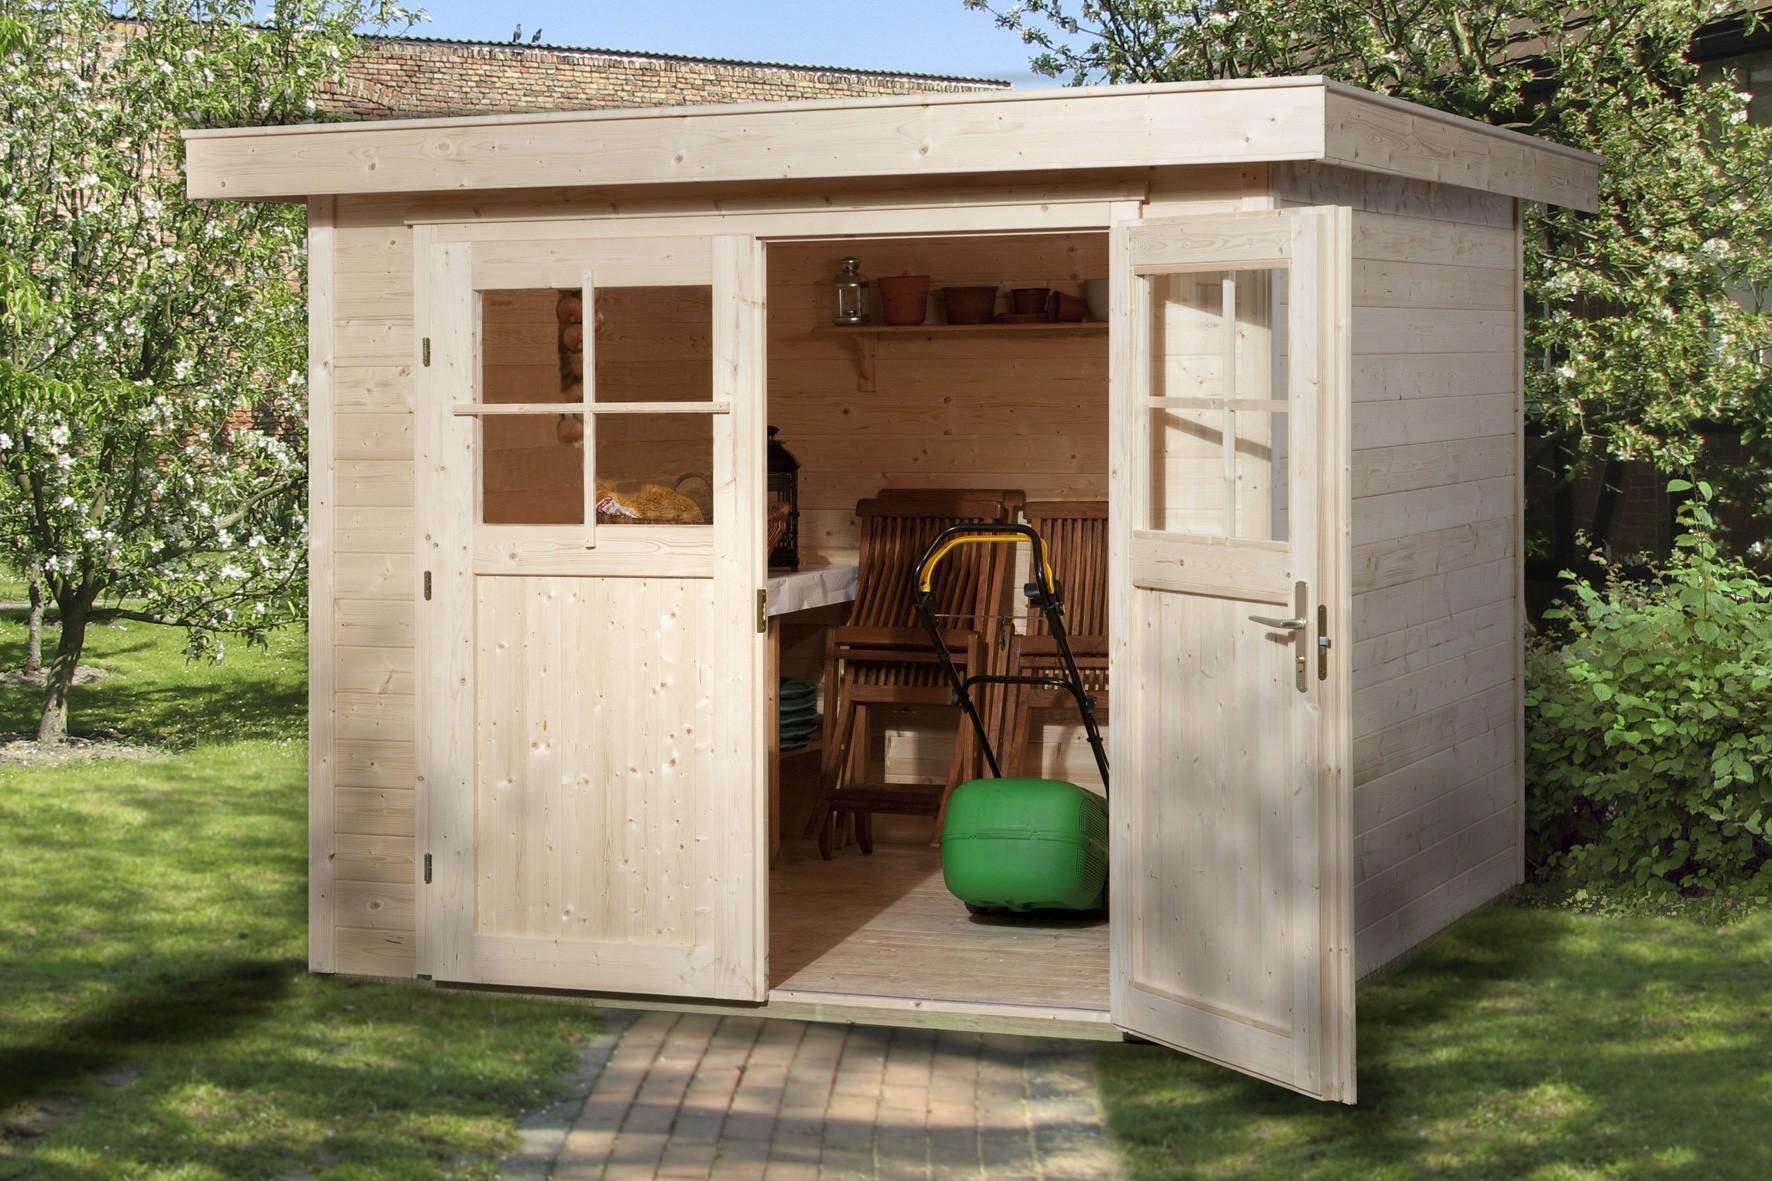 weka ger tehaus 21 mm gartenhaus 227 gr 2 natur 255x280cm bei. Black Bedroom Furniture Sets. Home Design Ideas